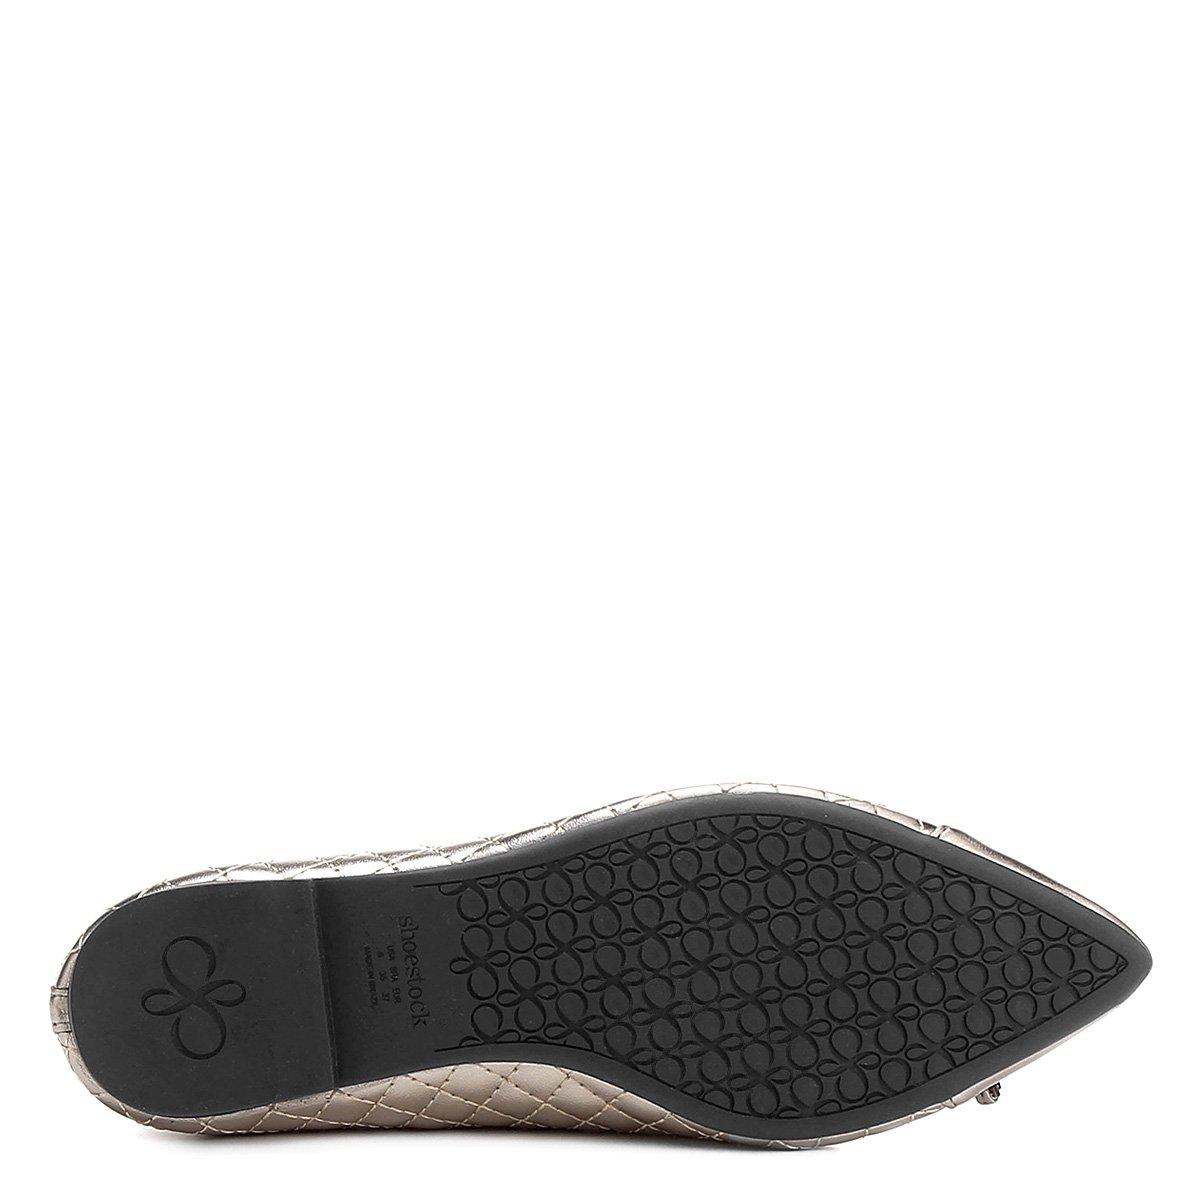 Fino Chumbo Sapatilha Shoestock Shoestock Bico Matelassê Sapatilha wxYXzHqZ